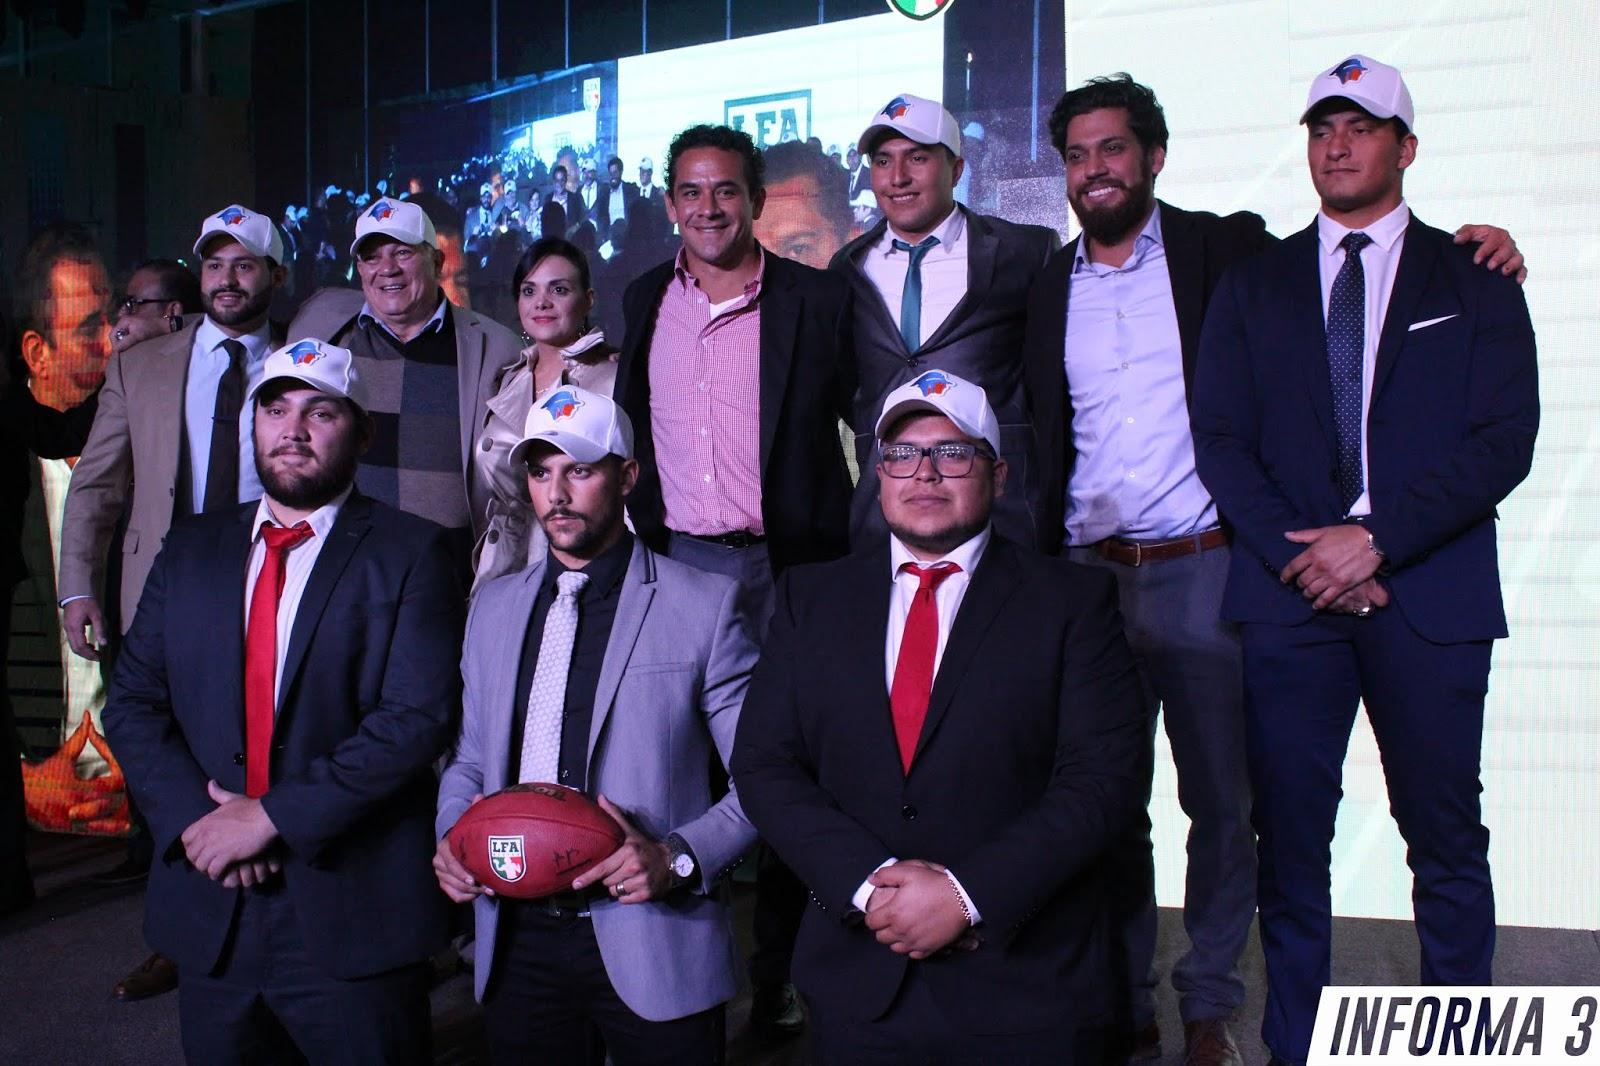 Jugadores seleccionados por Artilleros, Draft LFA 2019